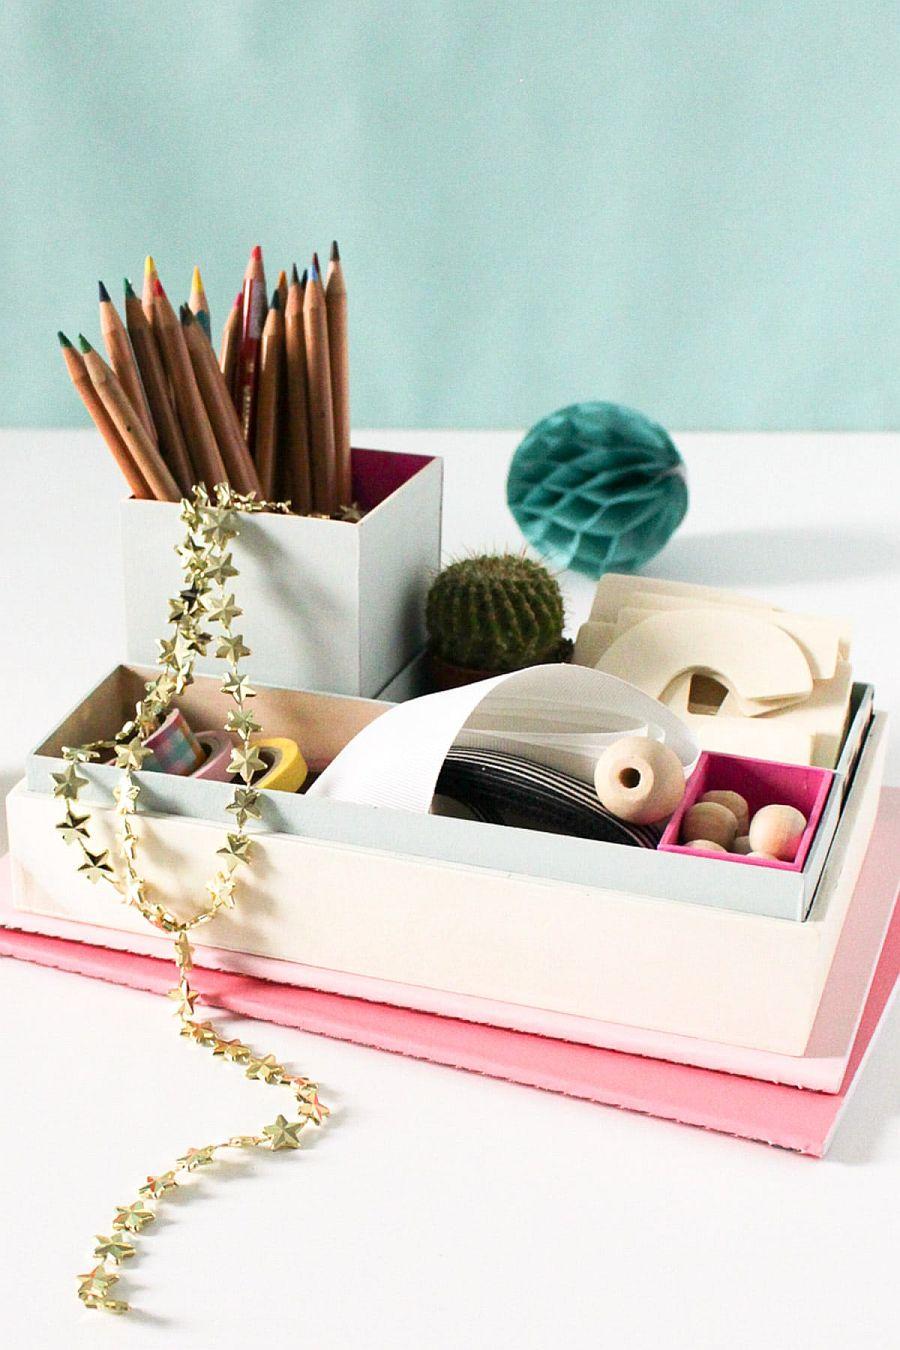 Easy-to-craft nesting DIY organizer idea